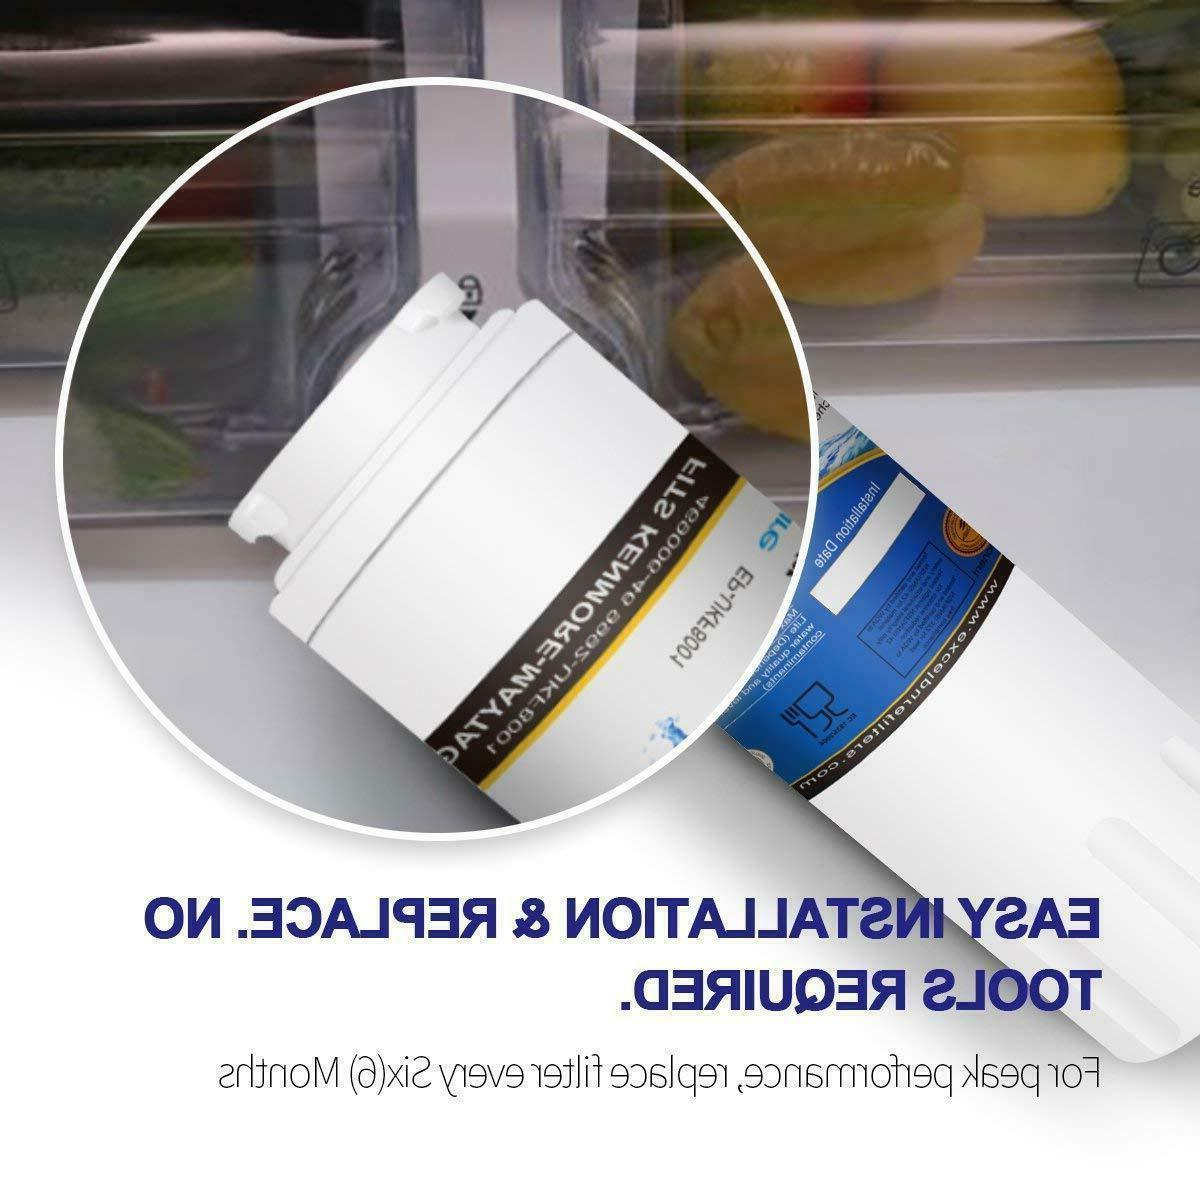 reverse osmosis water filter waterfilterguide biz